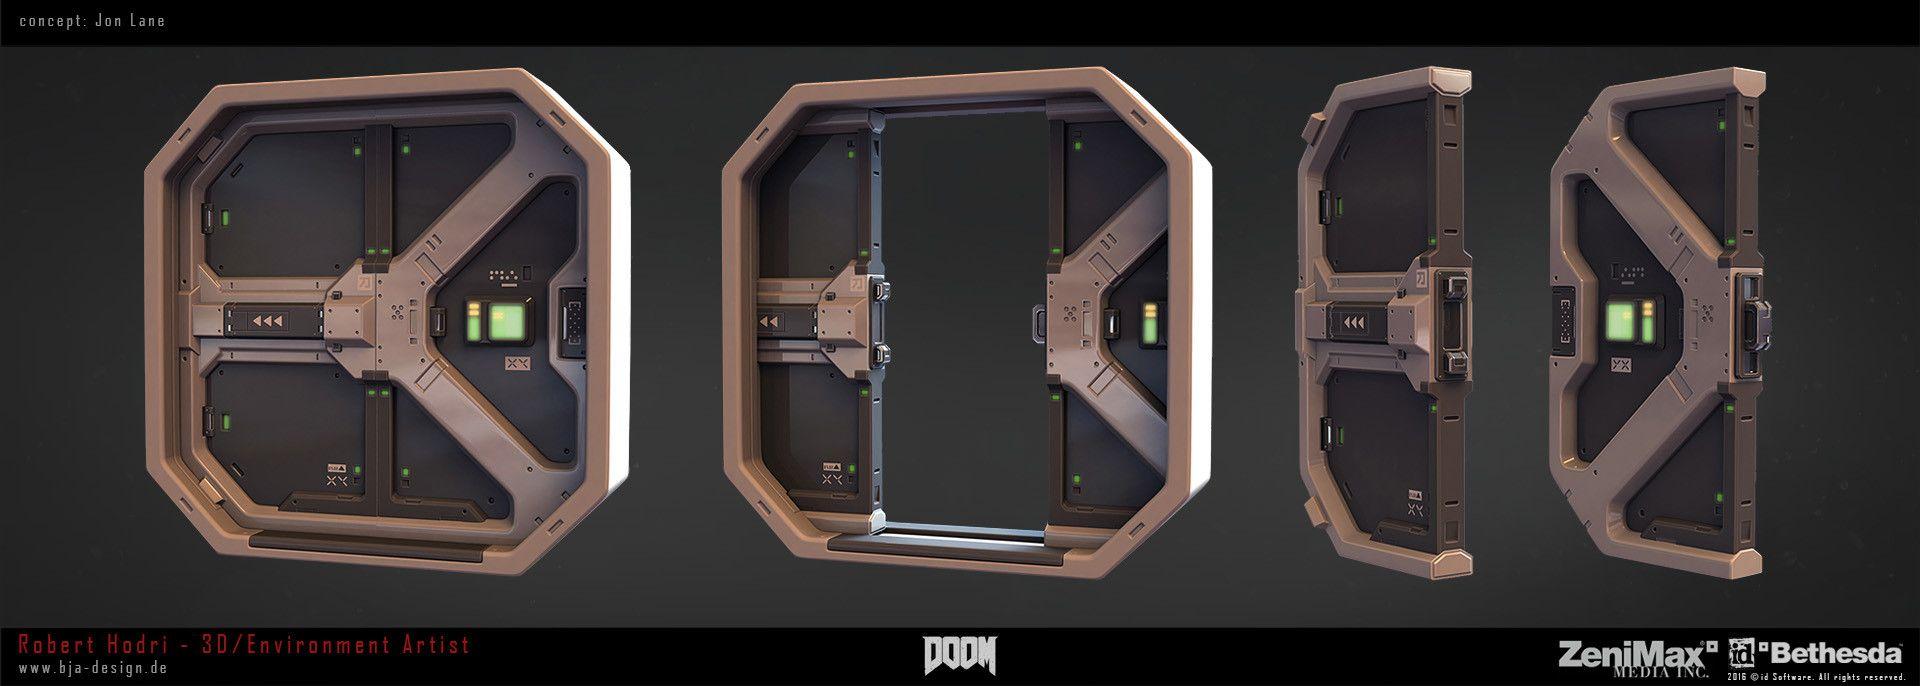 Doom Doors Robert Hodri Sci Fi Props Space Station Art Starship Design